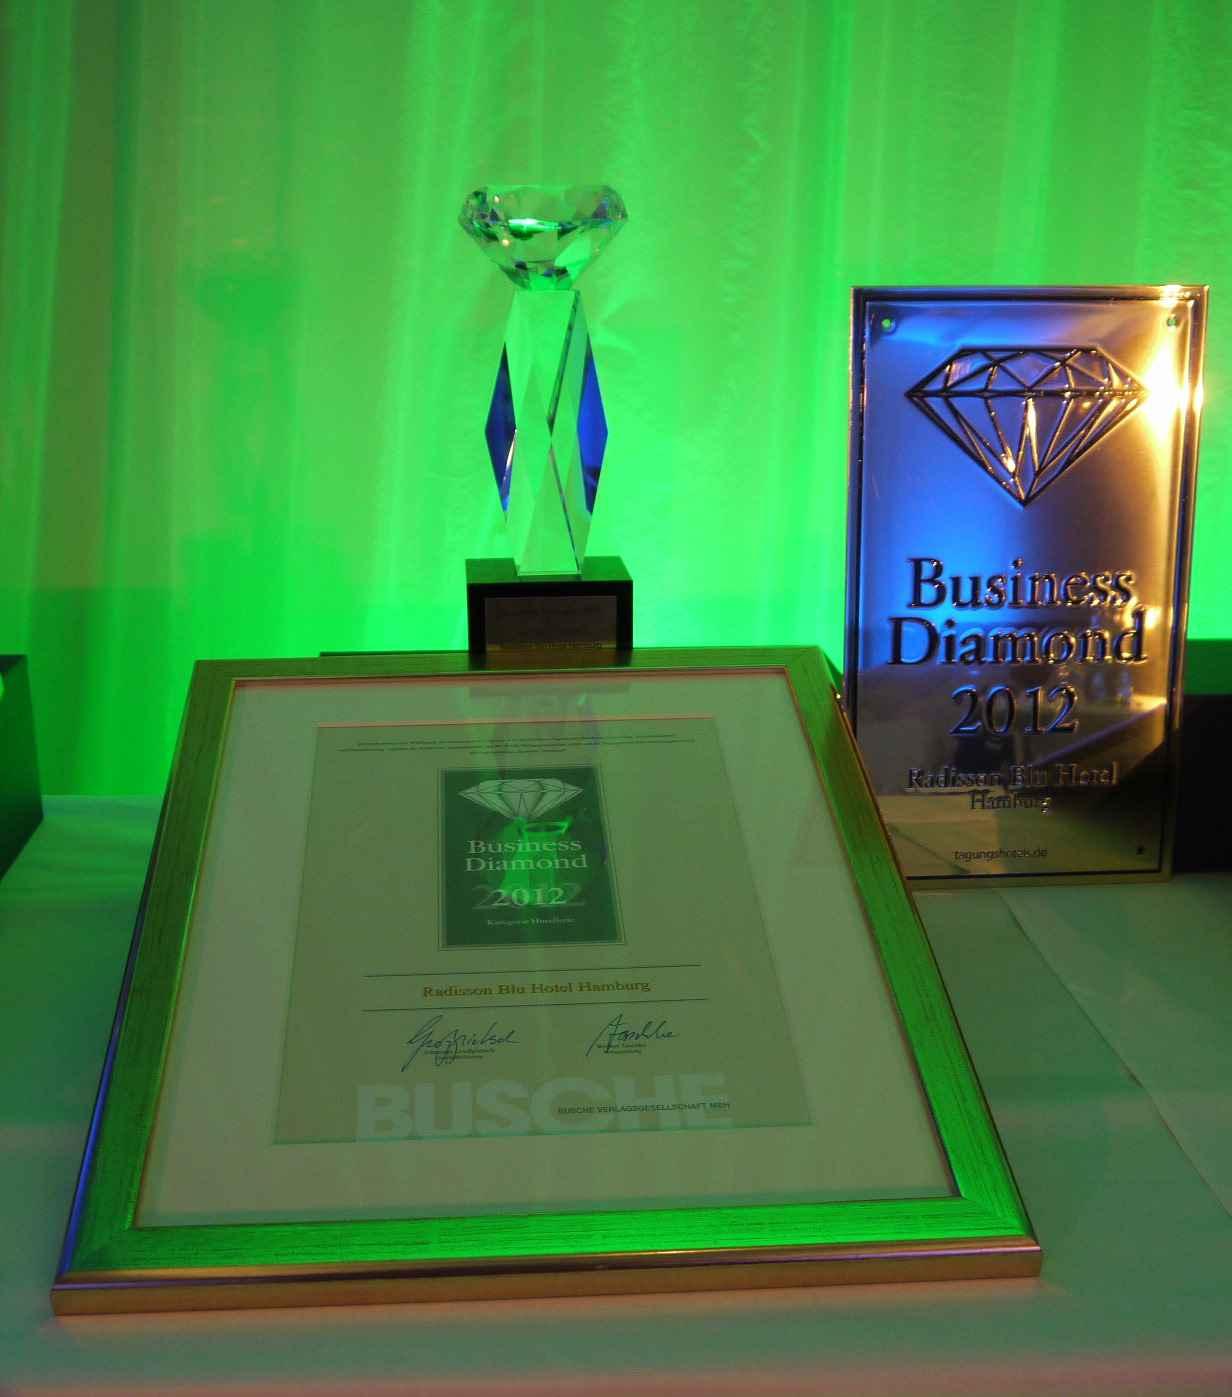 Business Diamond Award Radisson Blu Hotel Hamburg 2012